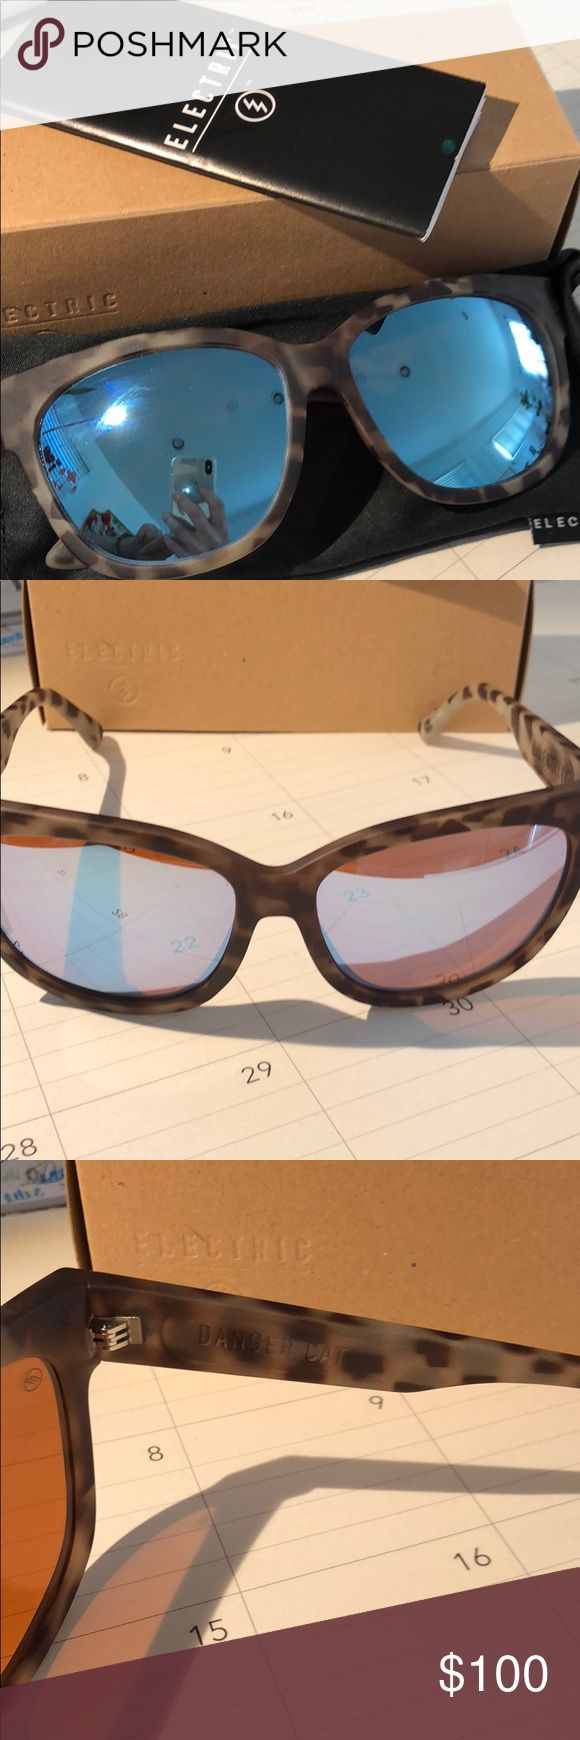 "New in box Electric ""Danger Cat"" sunglasses New in box Electric sunglasses. …"